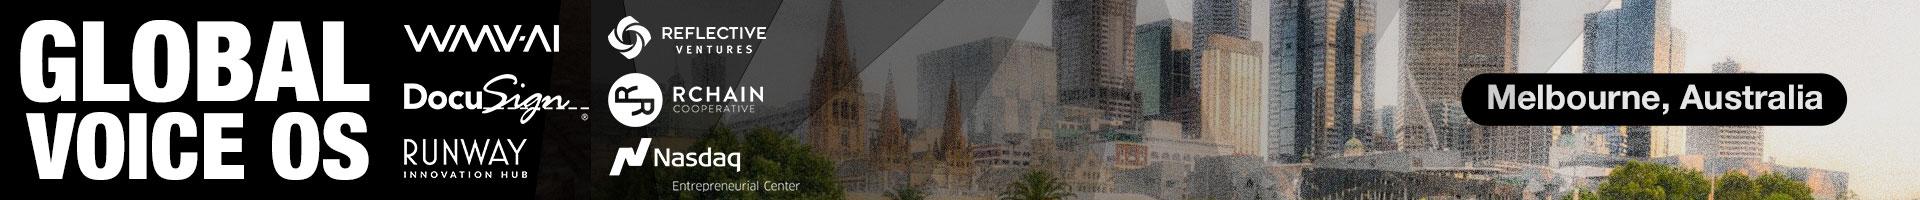 Event-Global-Voice-OS-1920x200-Melbourne-Australia